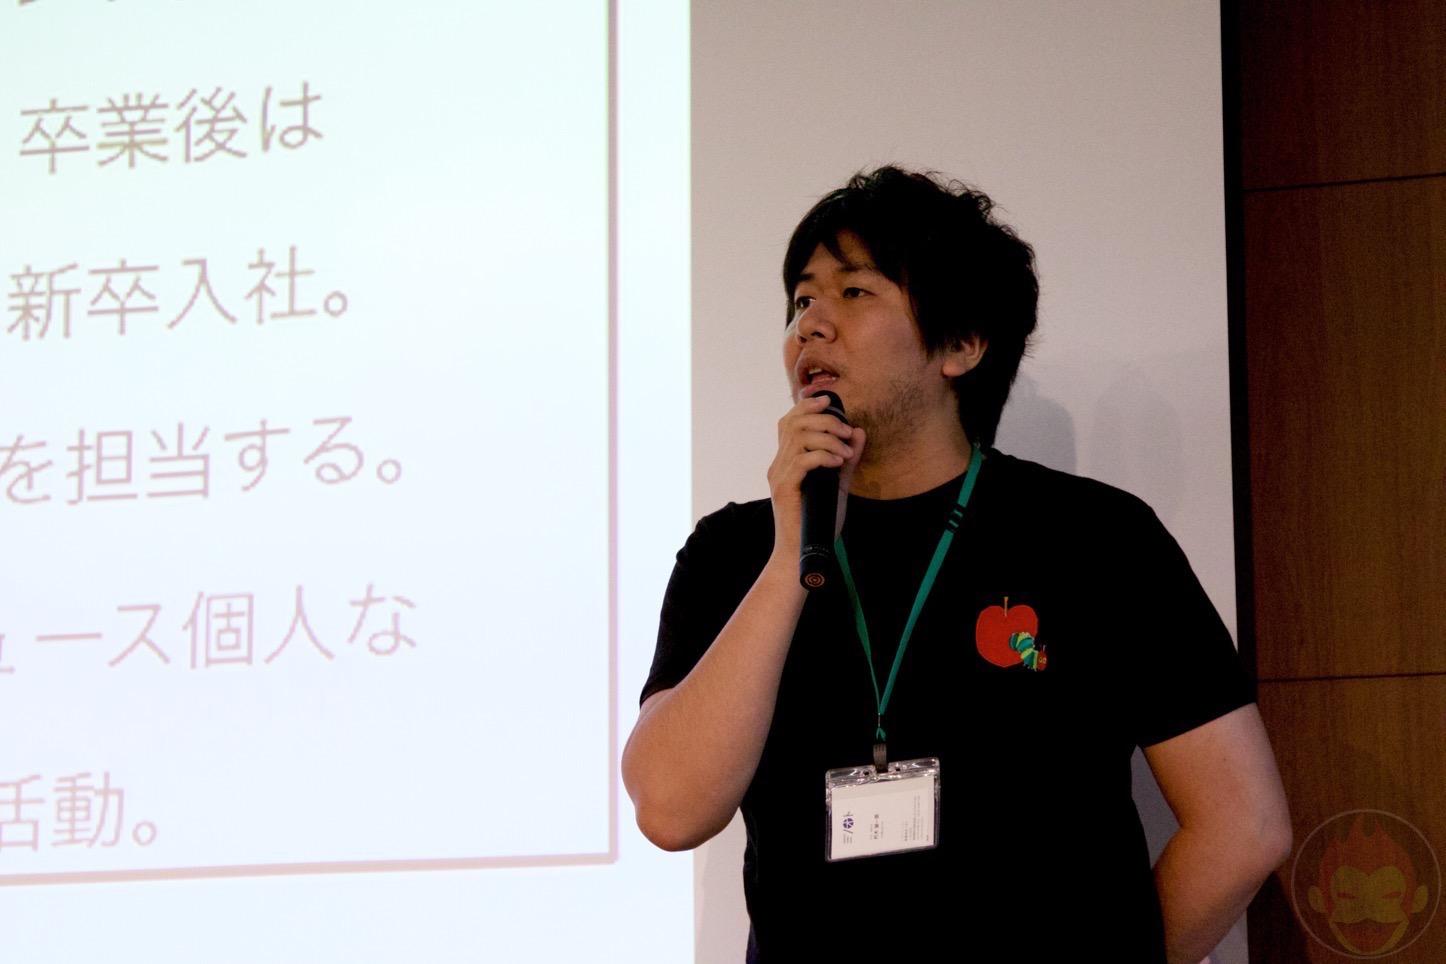 朽木誠一郎ーーBloggers Festival 2015